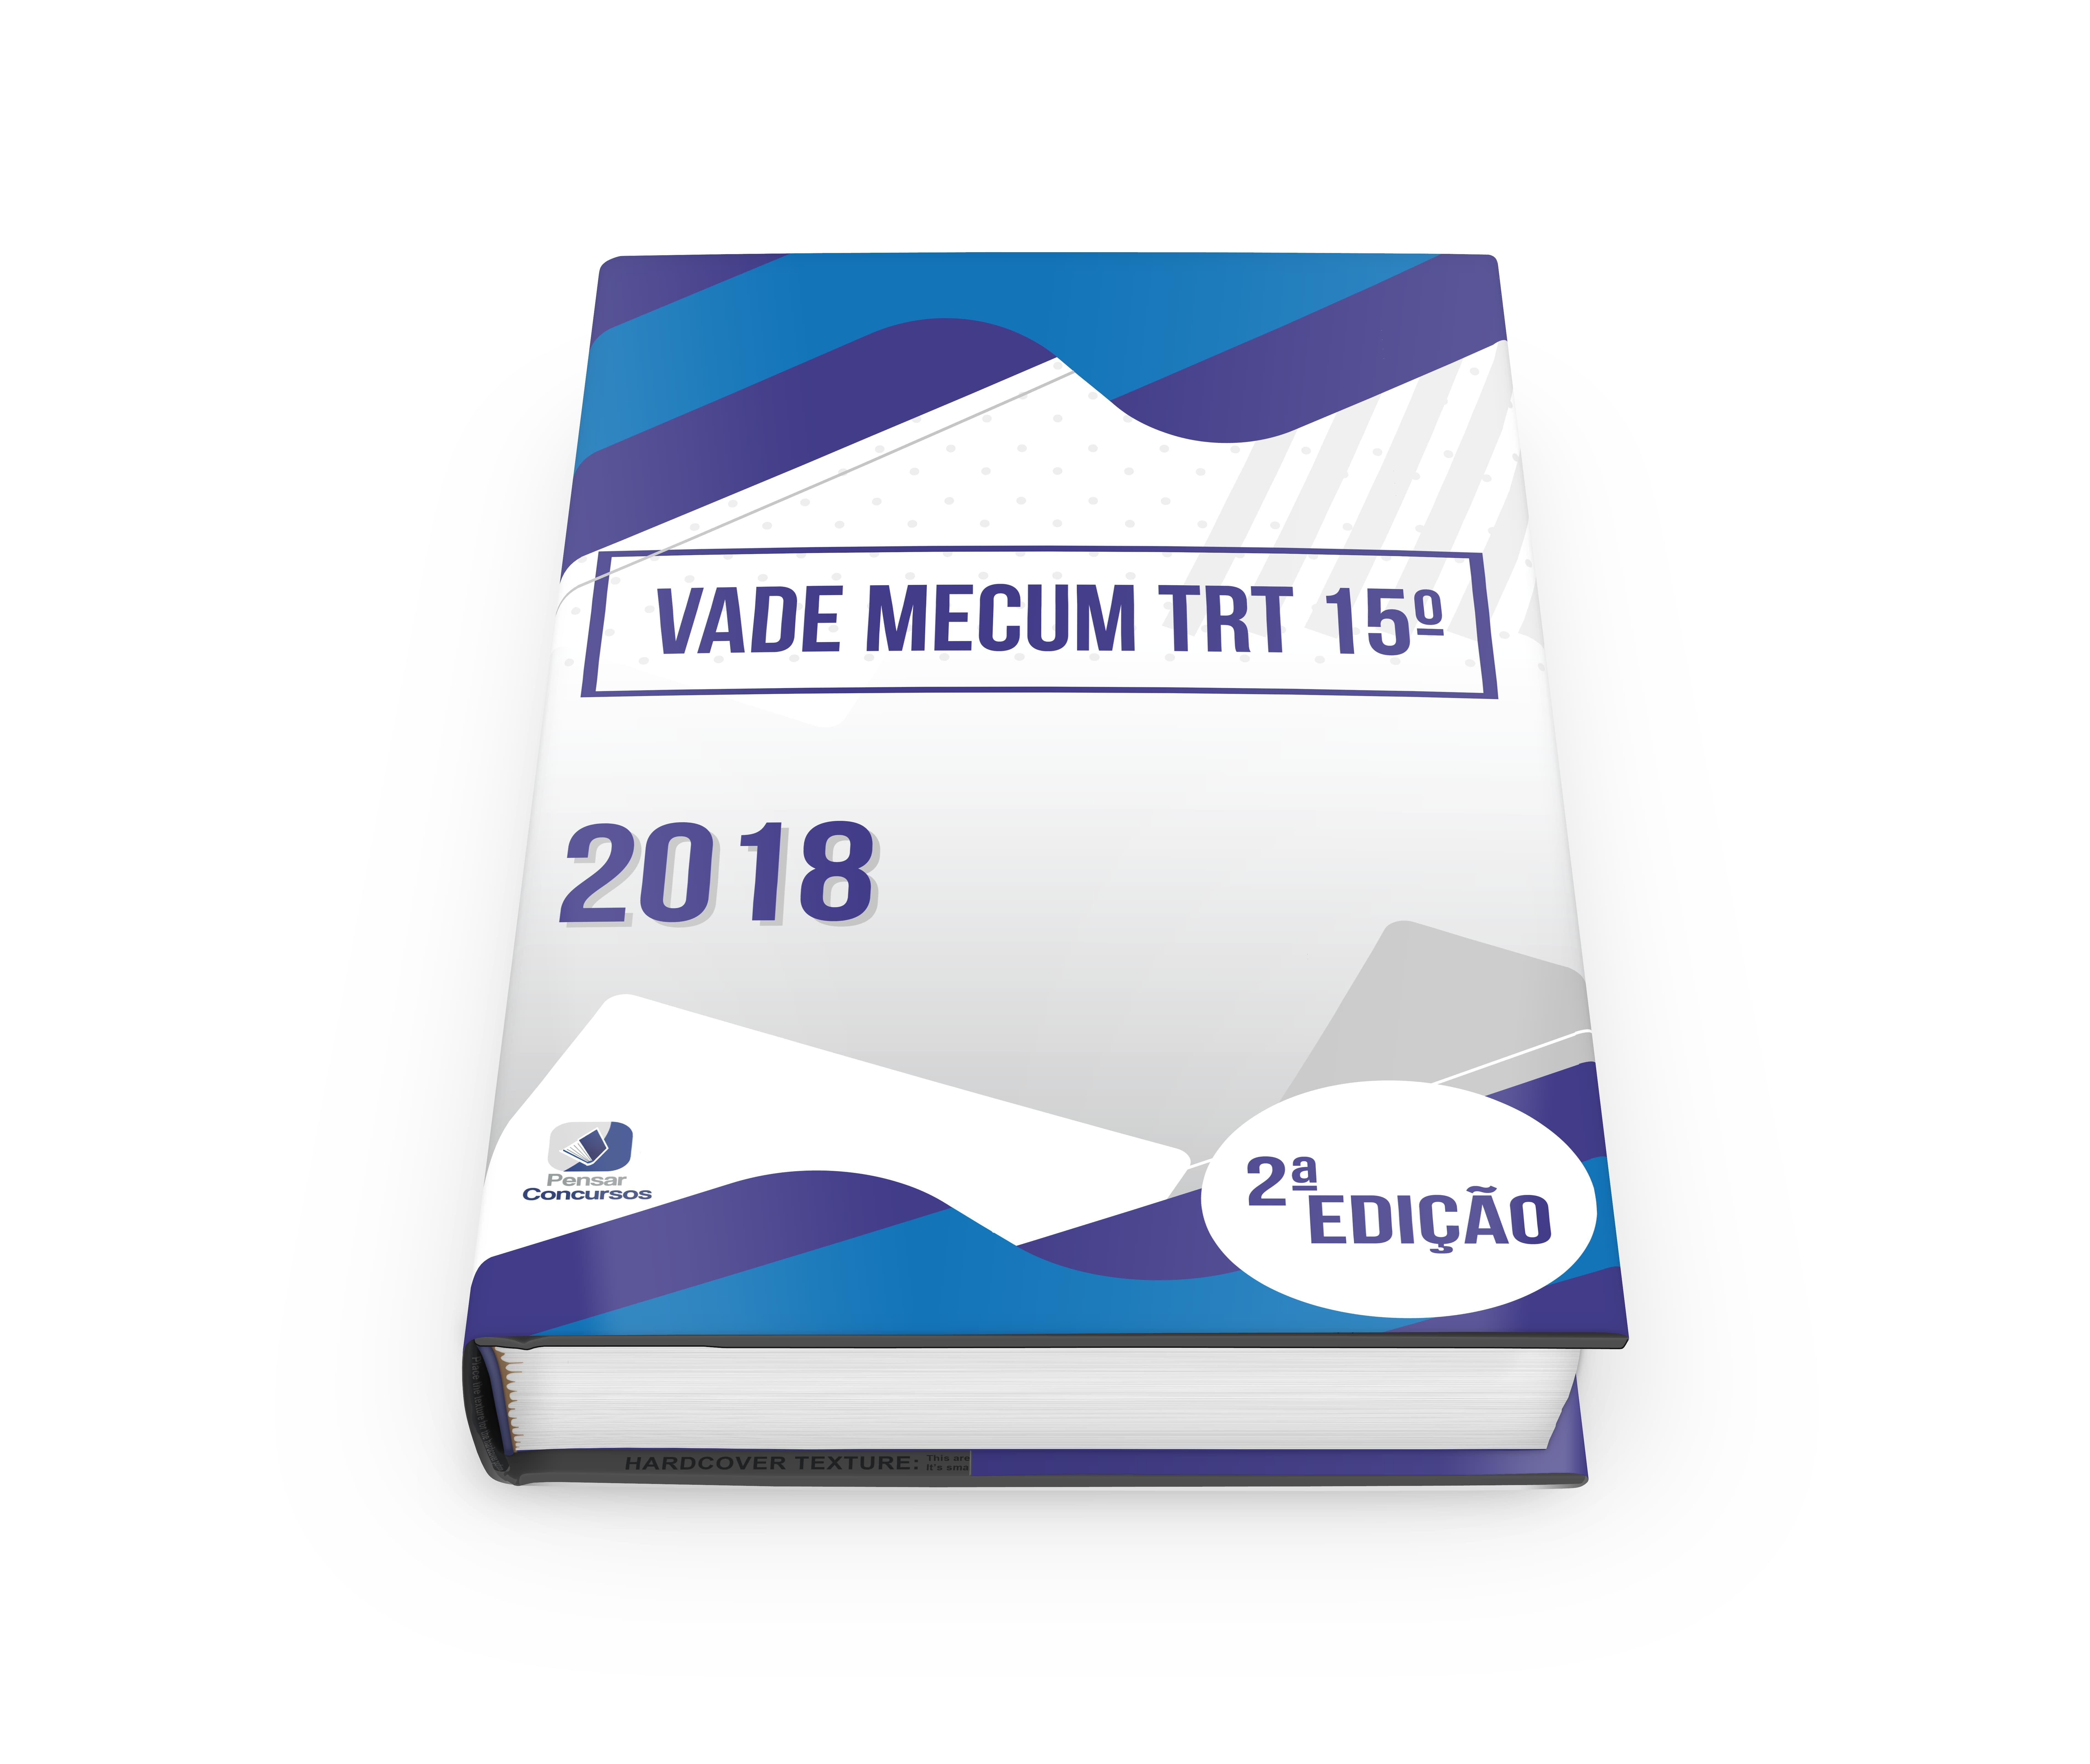 VADE MECUM TRT 15º - AJAJ